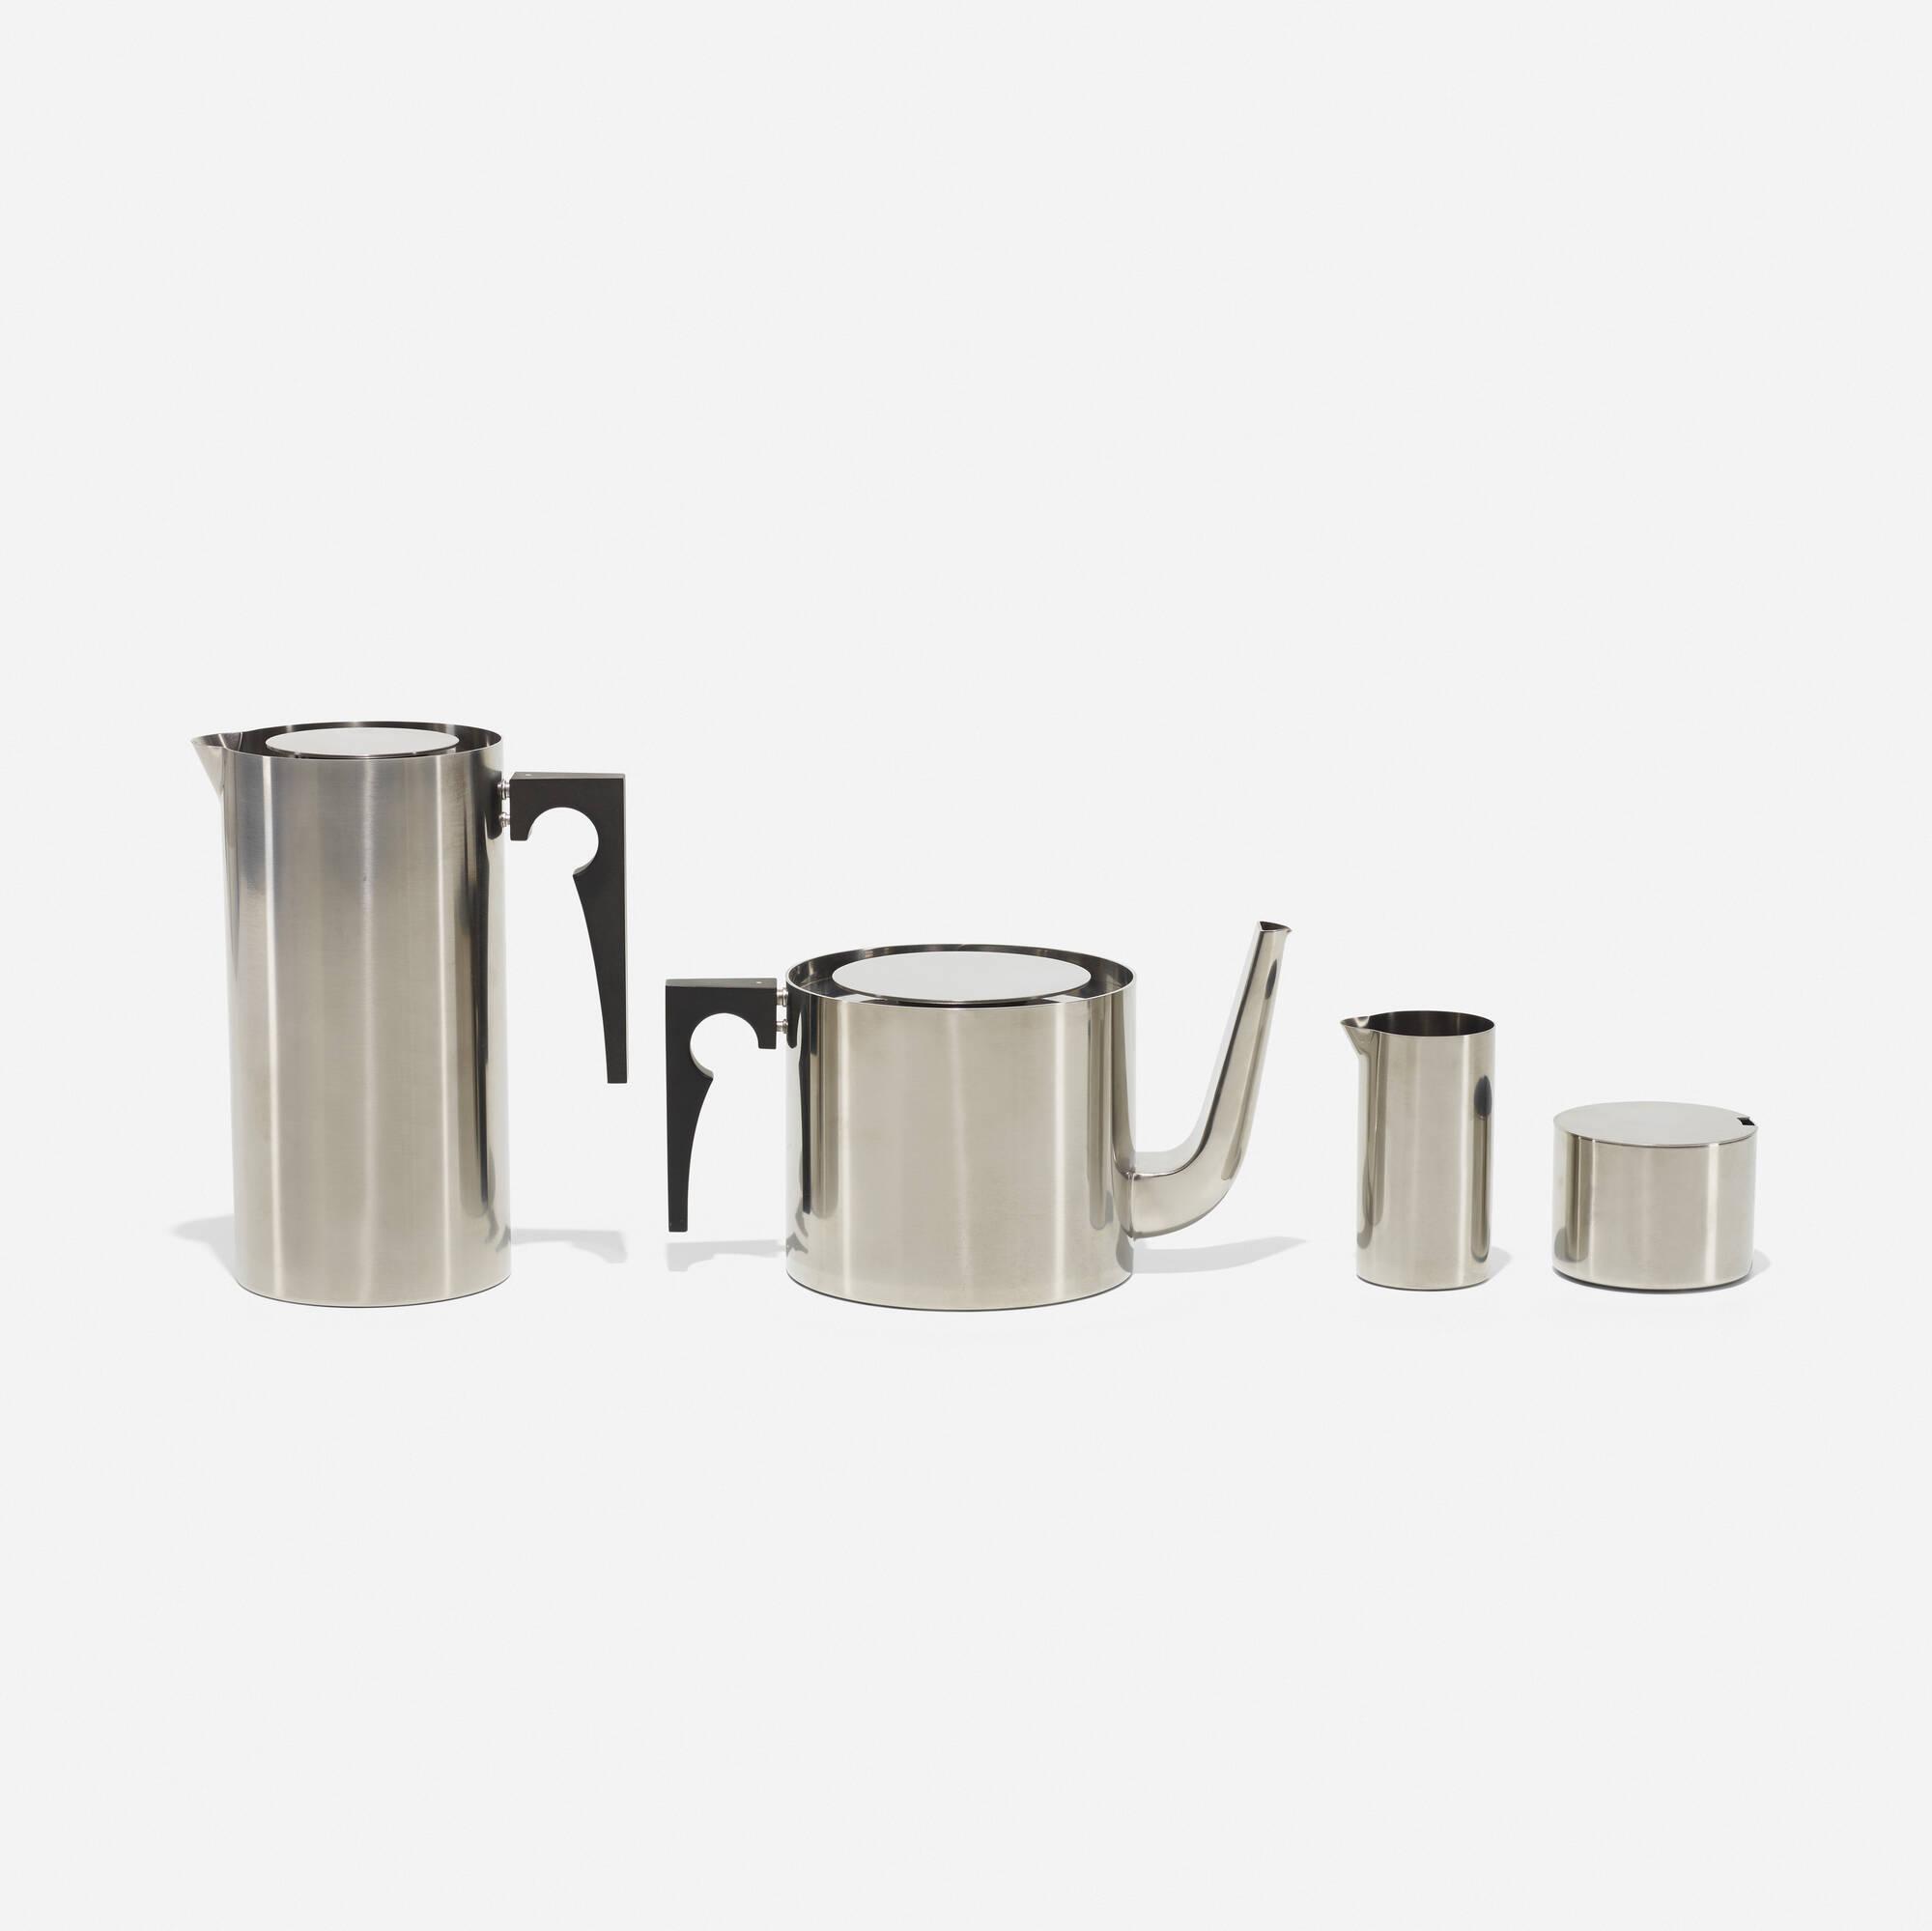 387: Arne Jacobsen / Cylinda tea and coffee service (1 of 2)